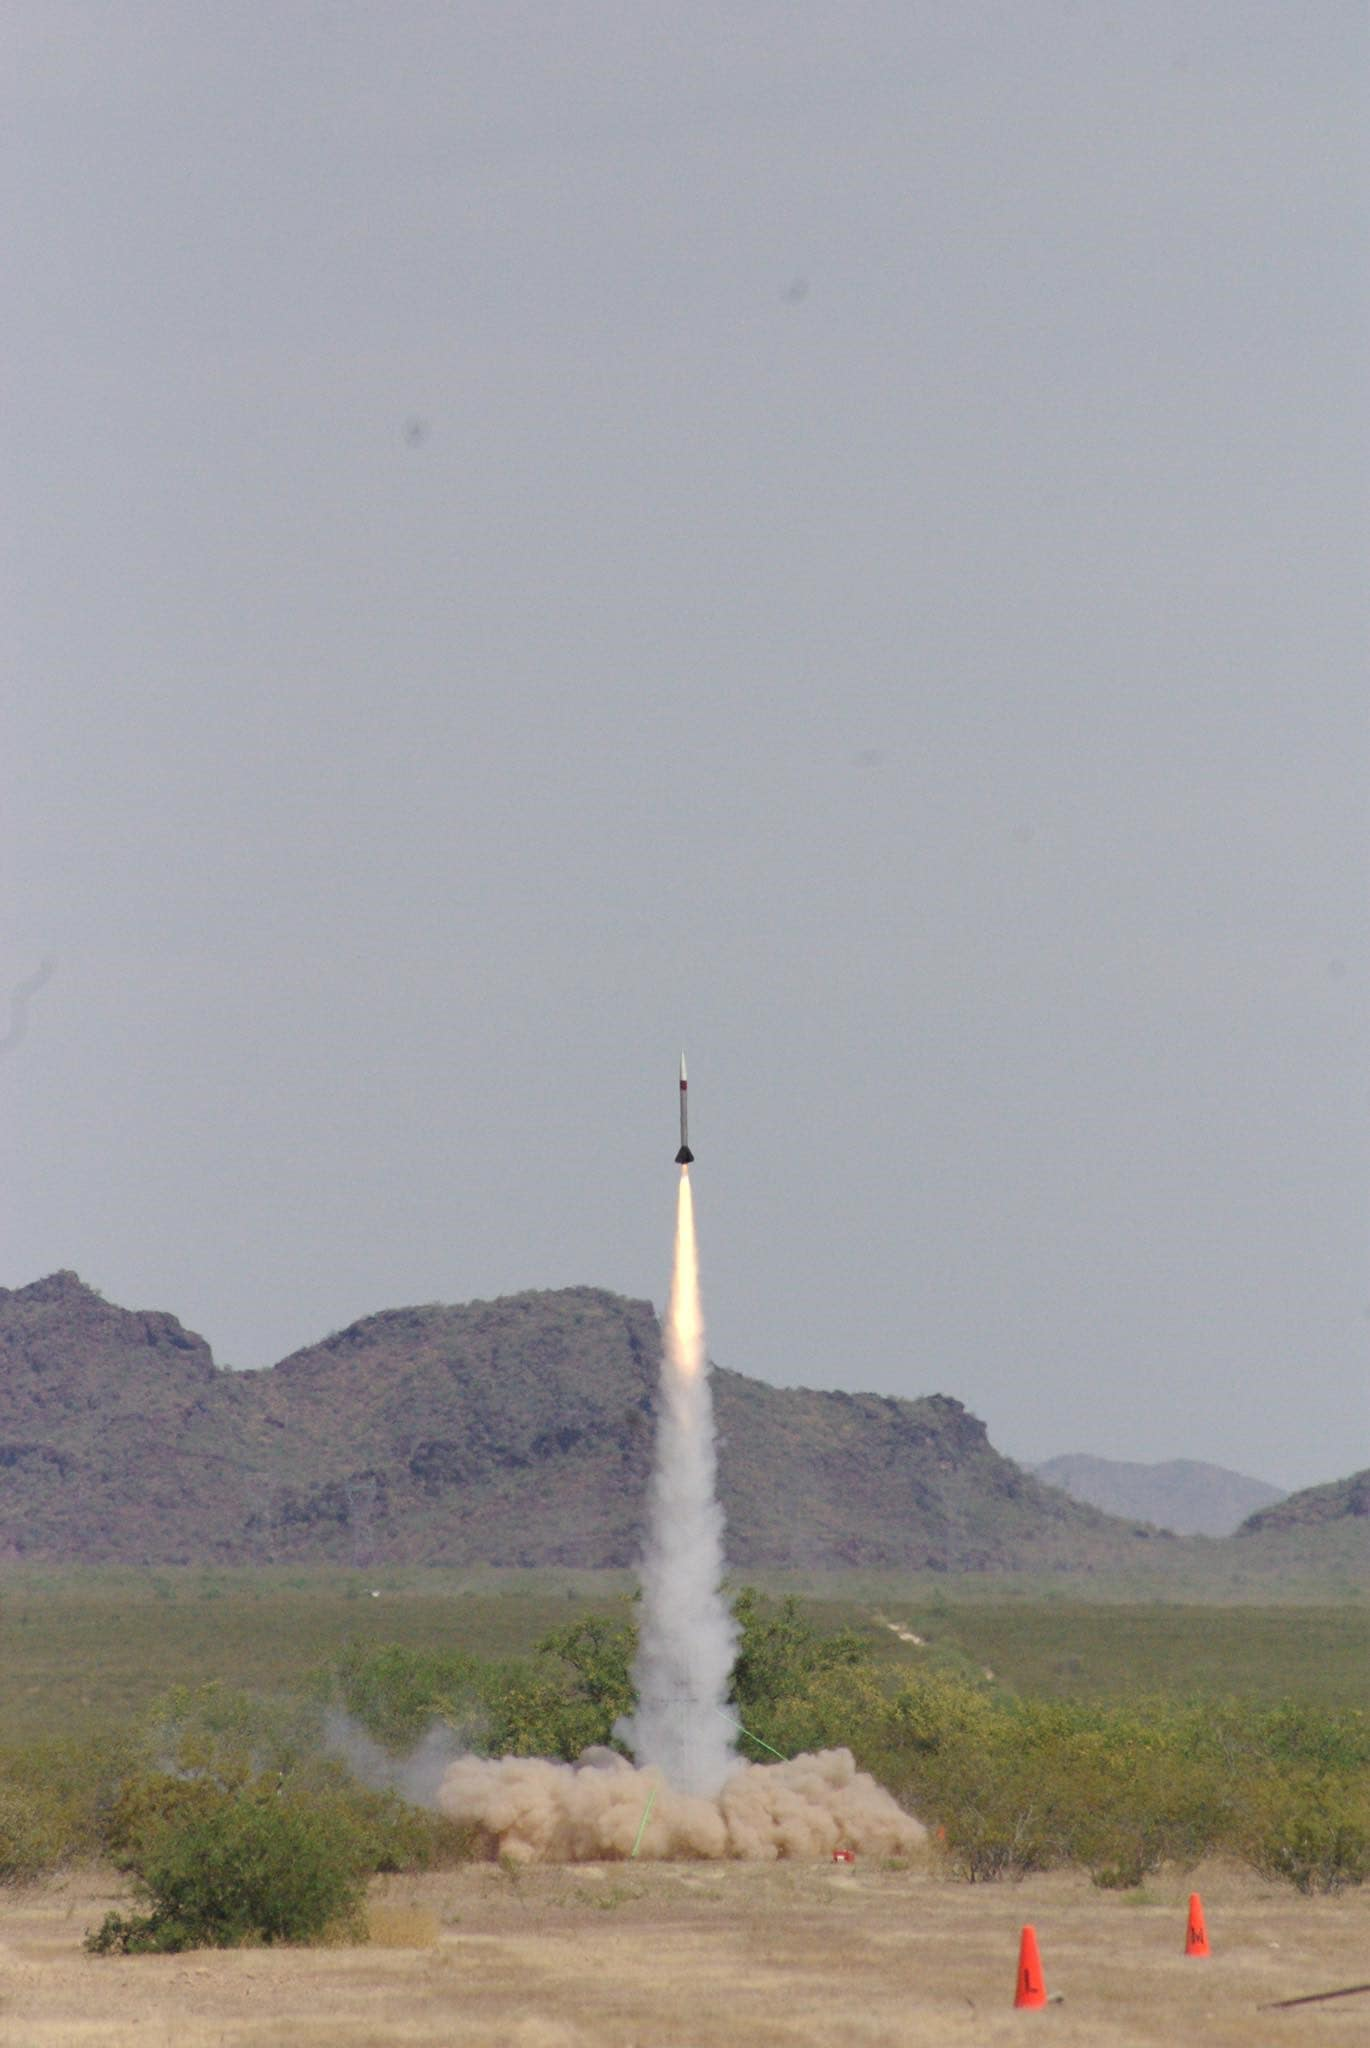 Prescott Rocket Team